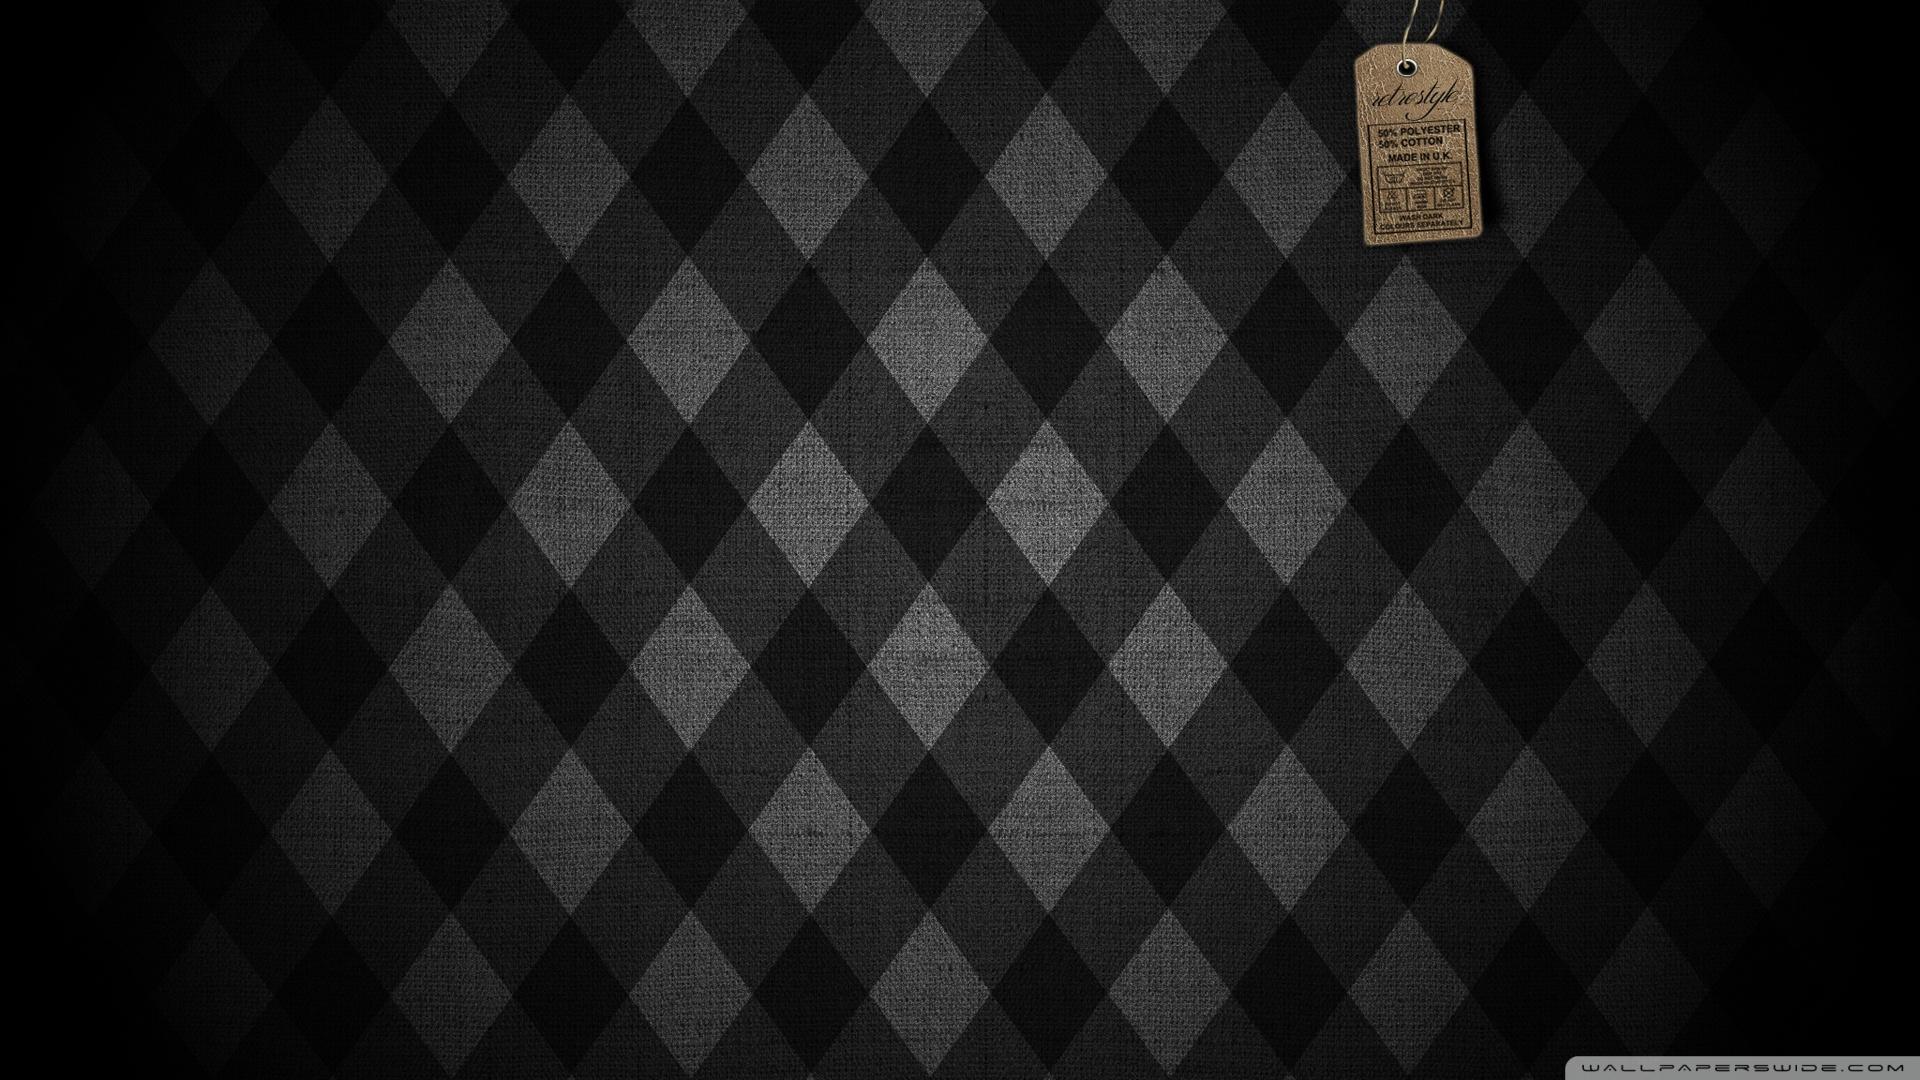 Made In Uk Wallpaper 1920x1080 Made In Uk 1920x1080